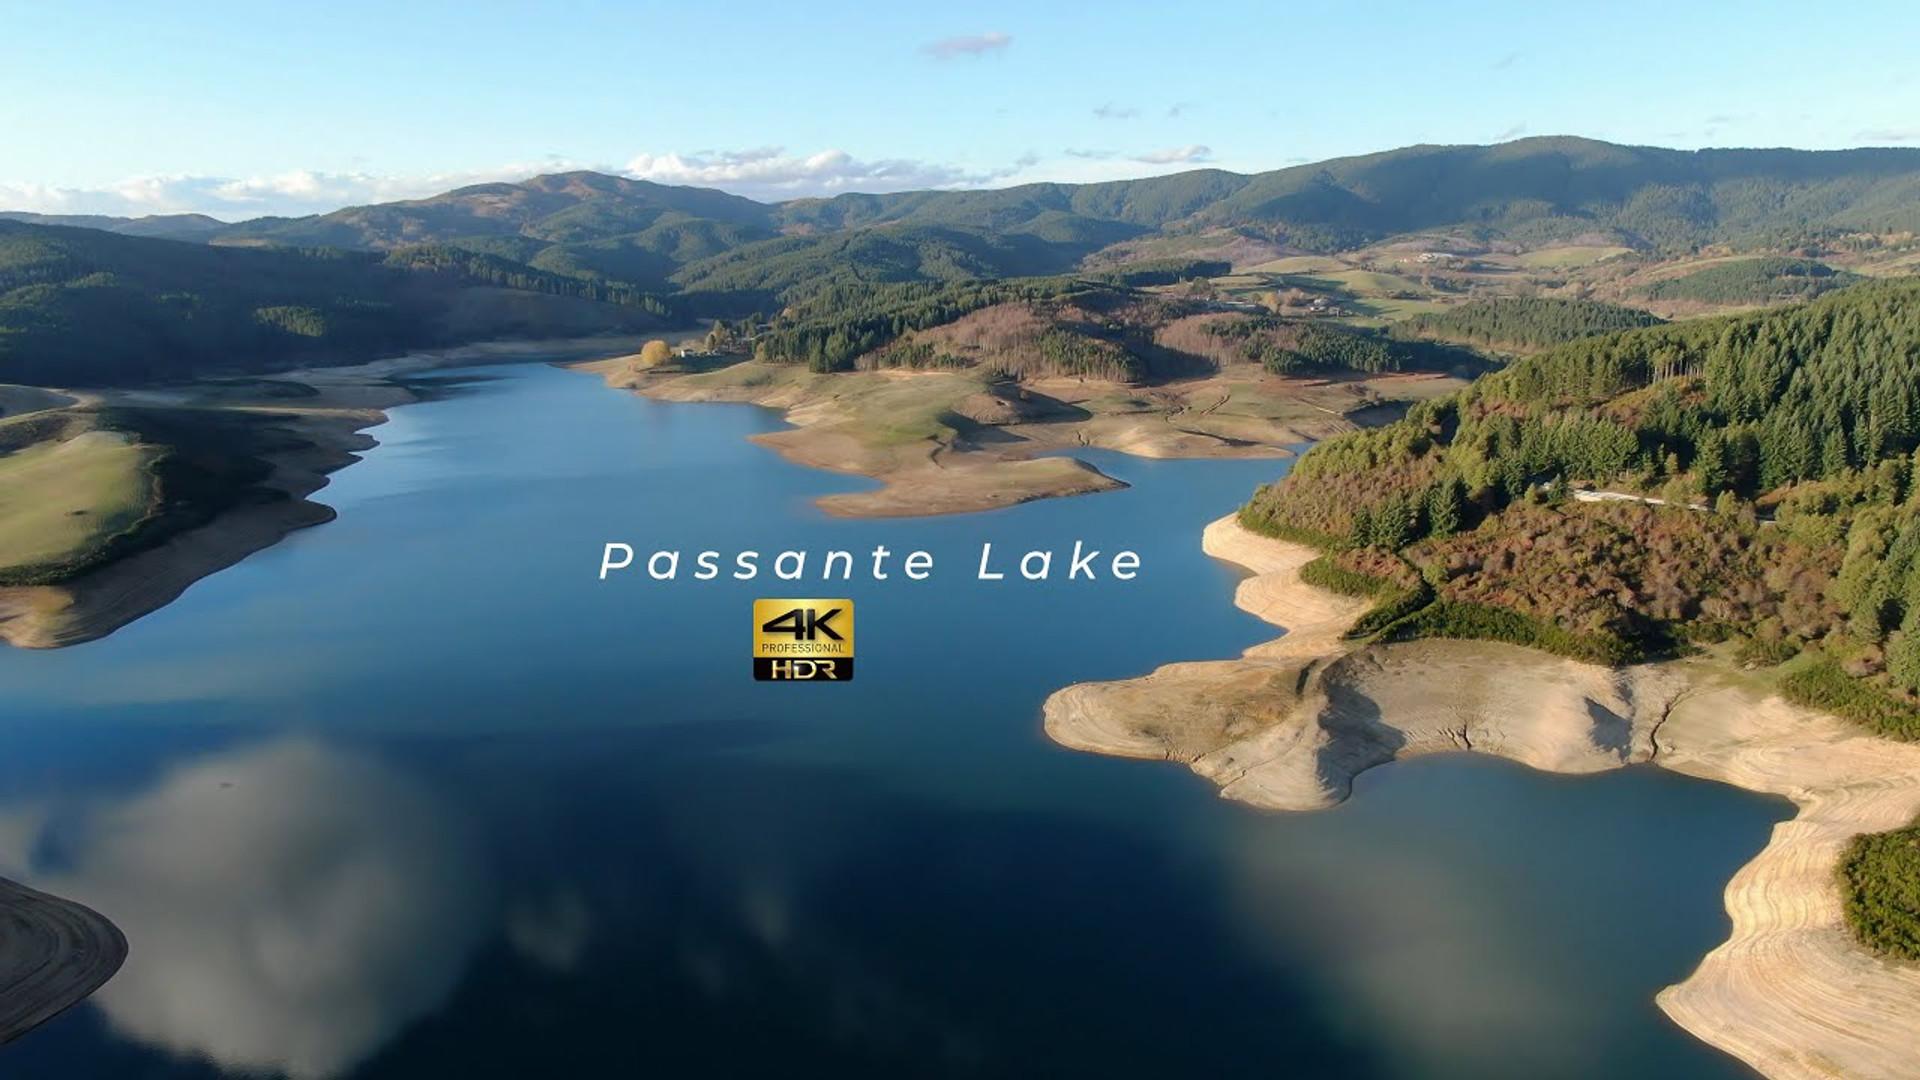 Taverna- Lago Passante